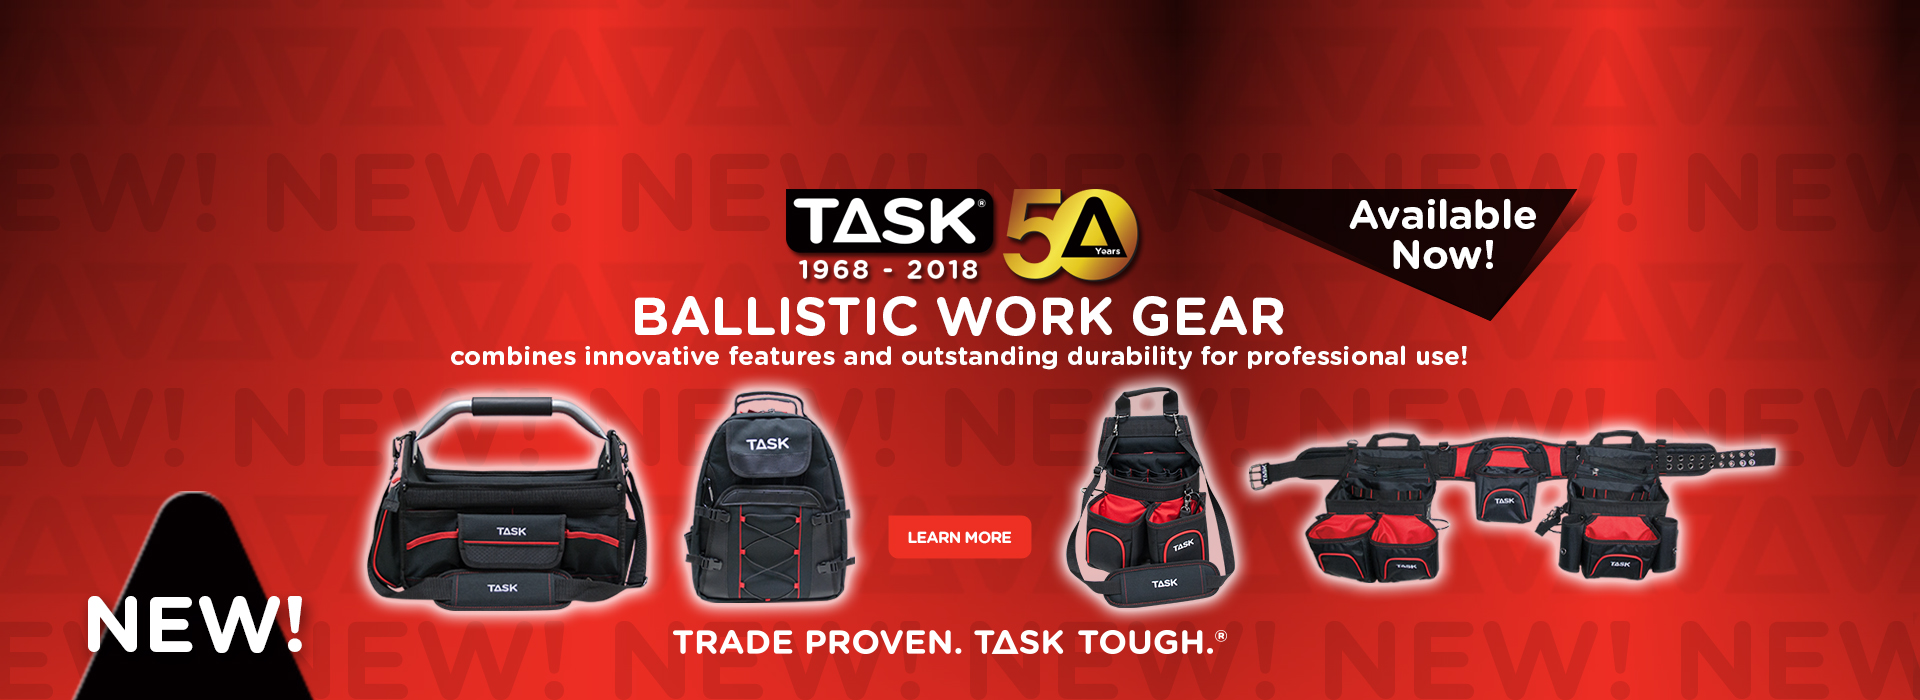 Ballistic Work Gear